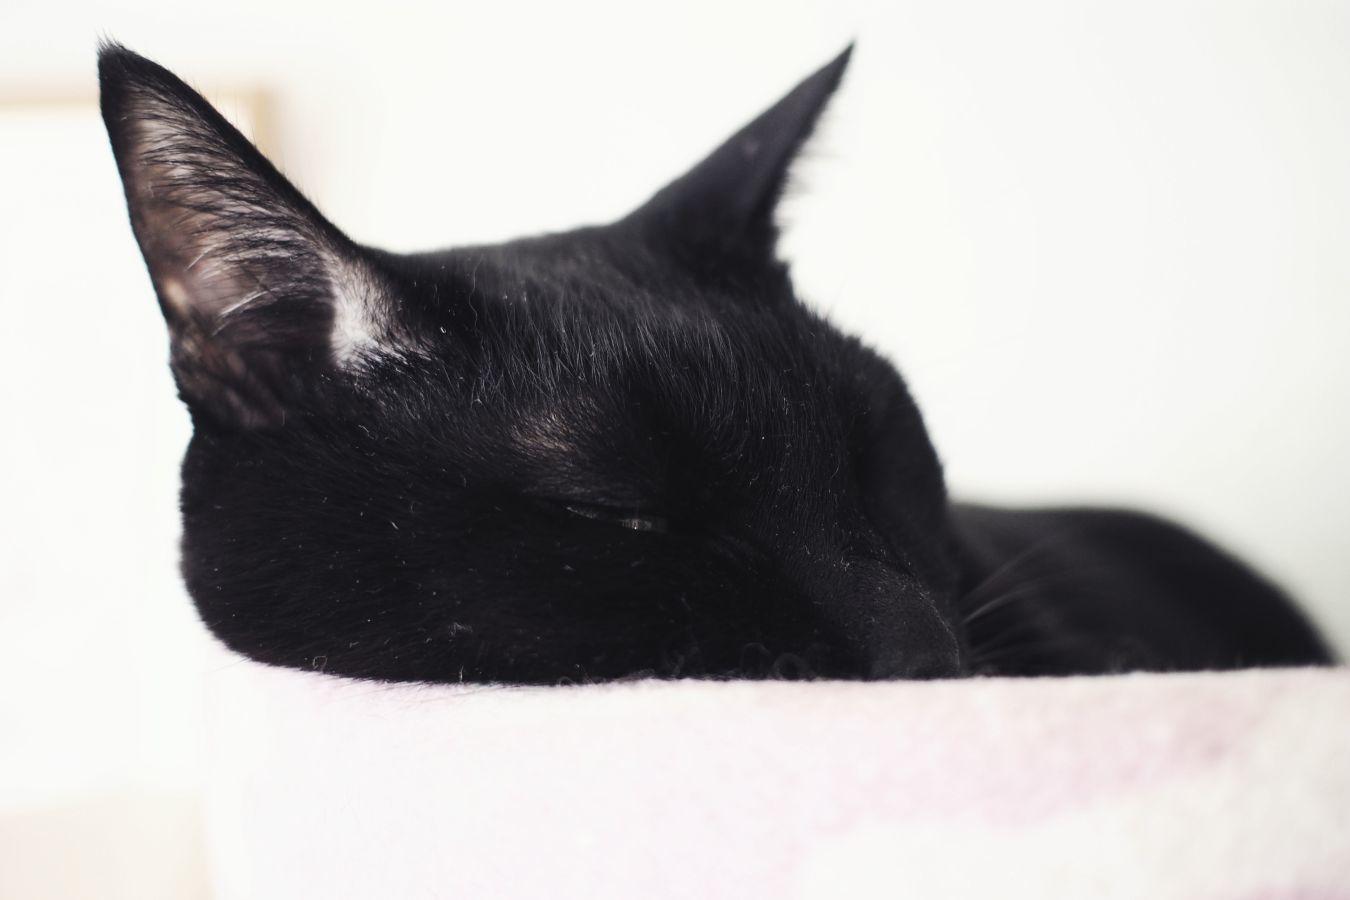 【Photo】ハロウィンは、黒猫_b0008655_19414023.jpg